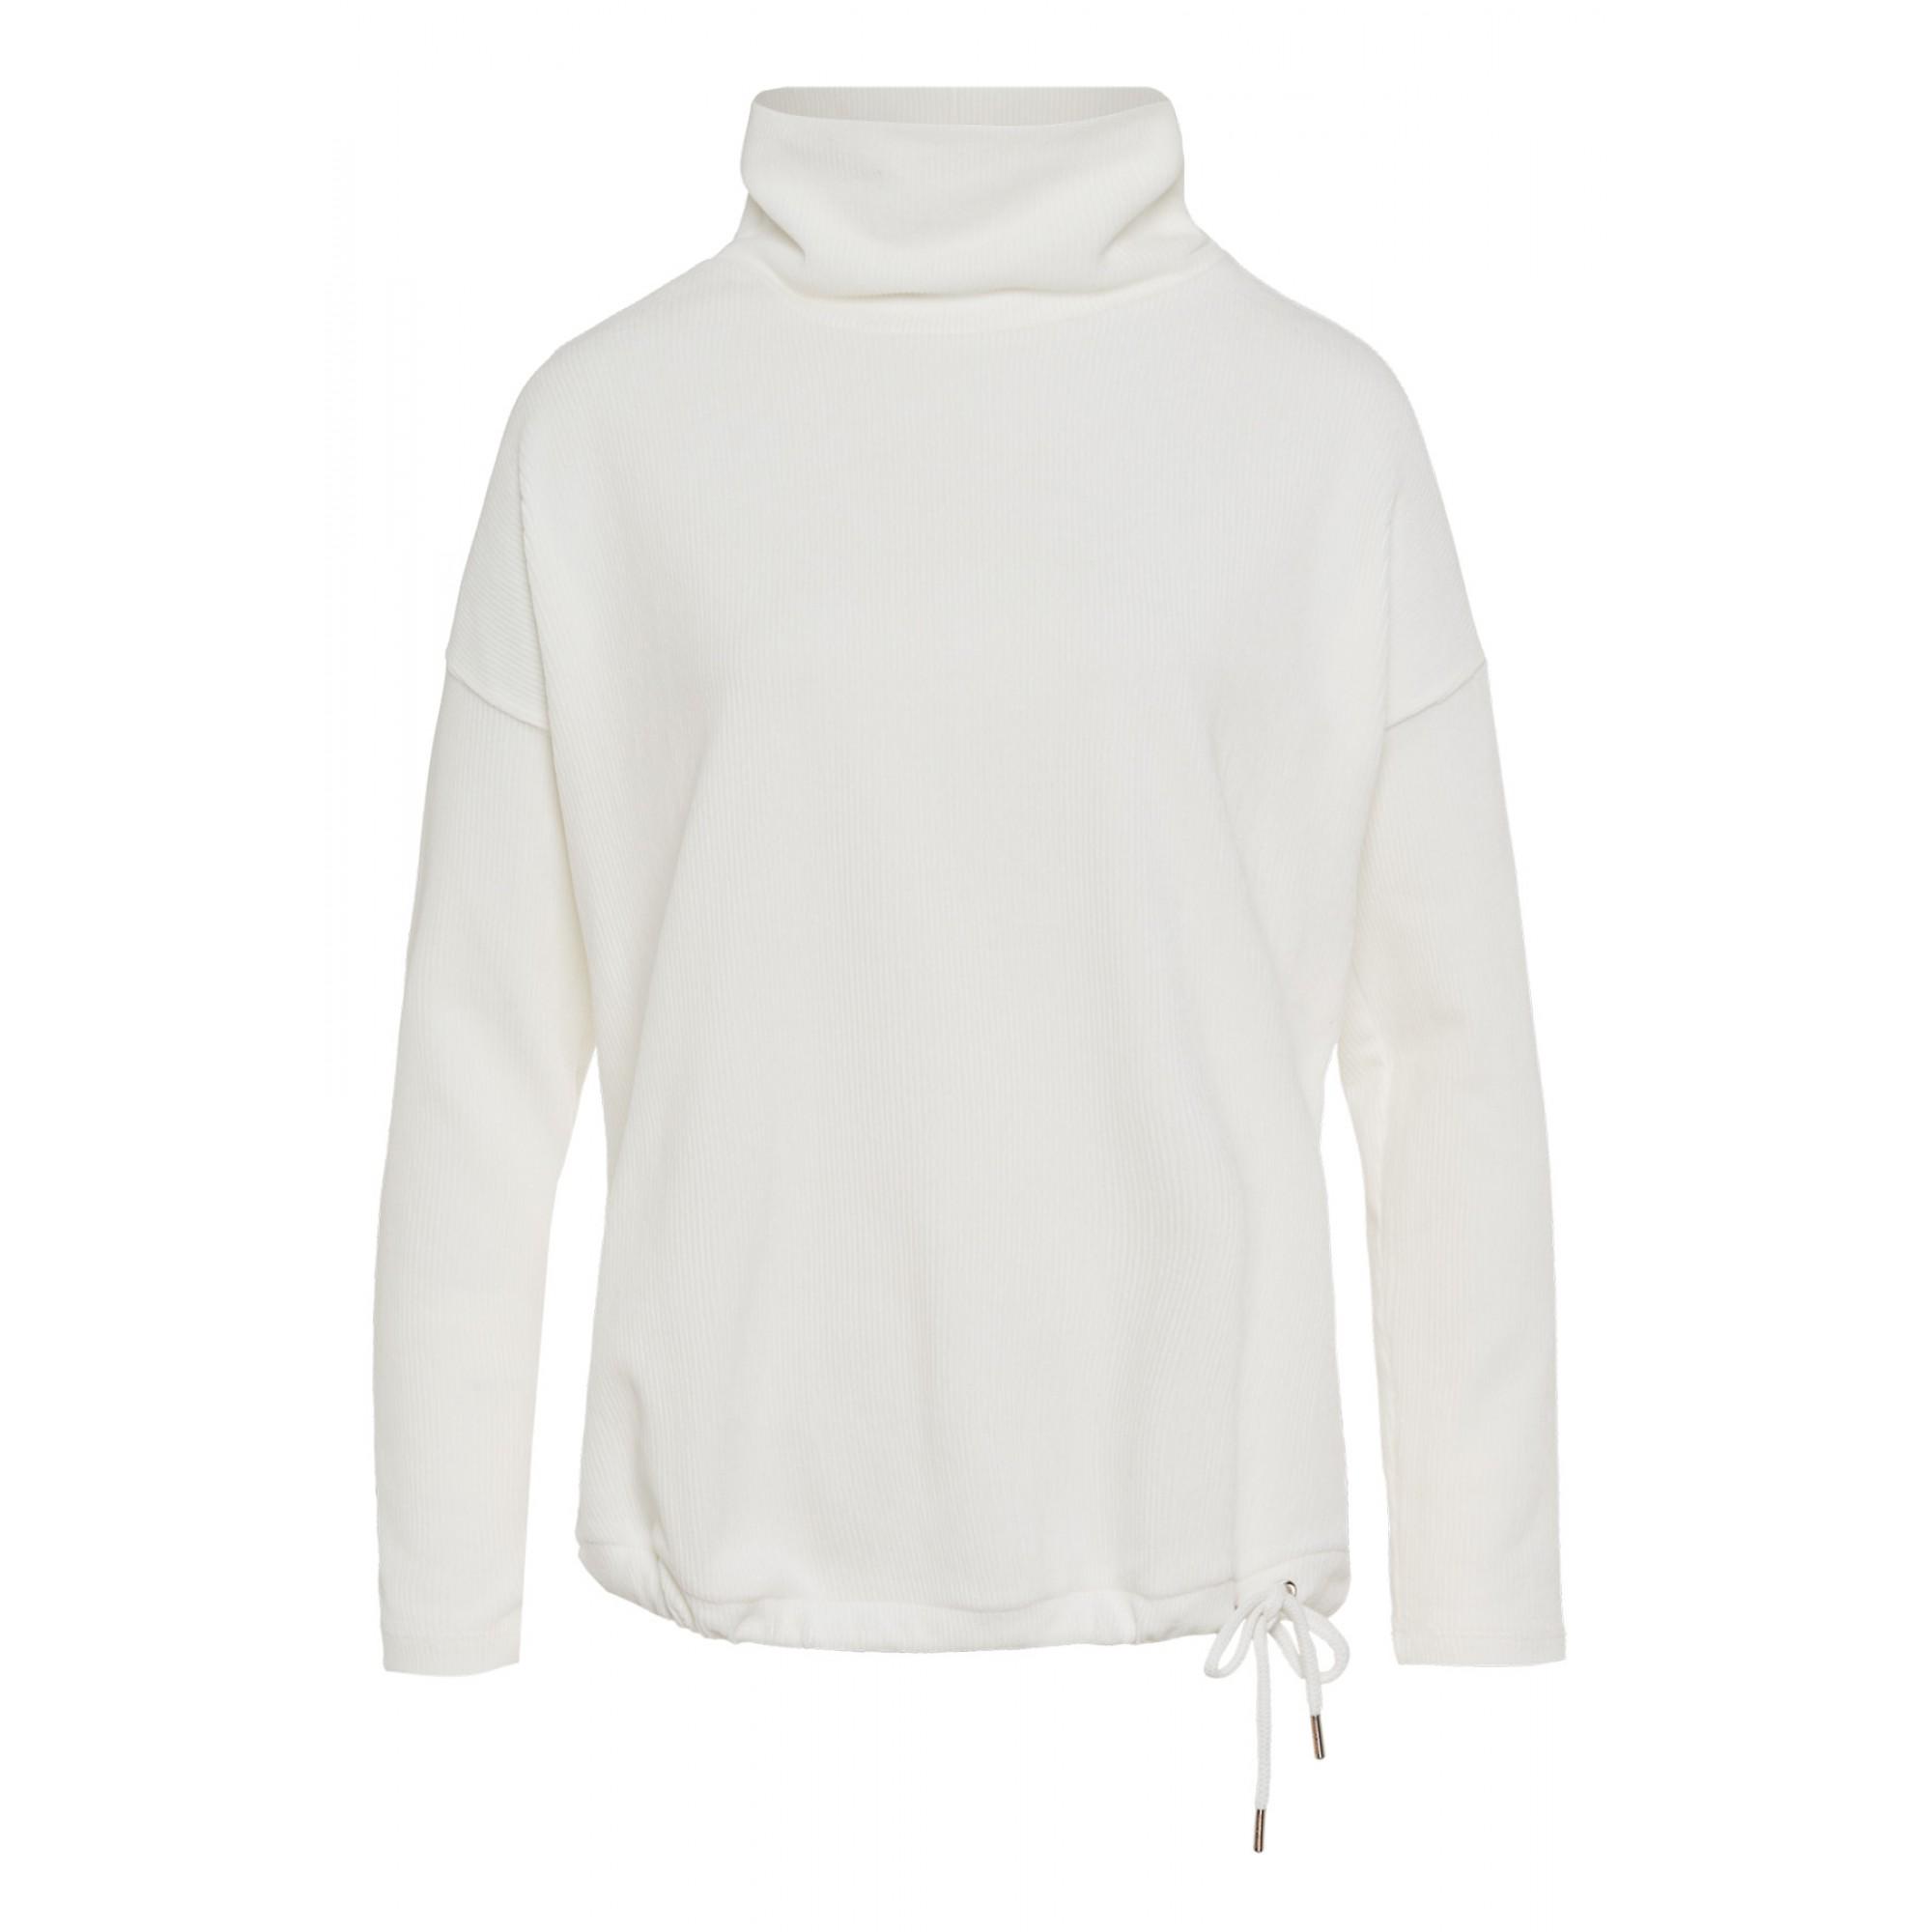 More & More Sweatshirt weiß